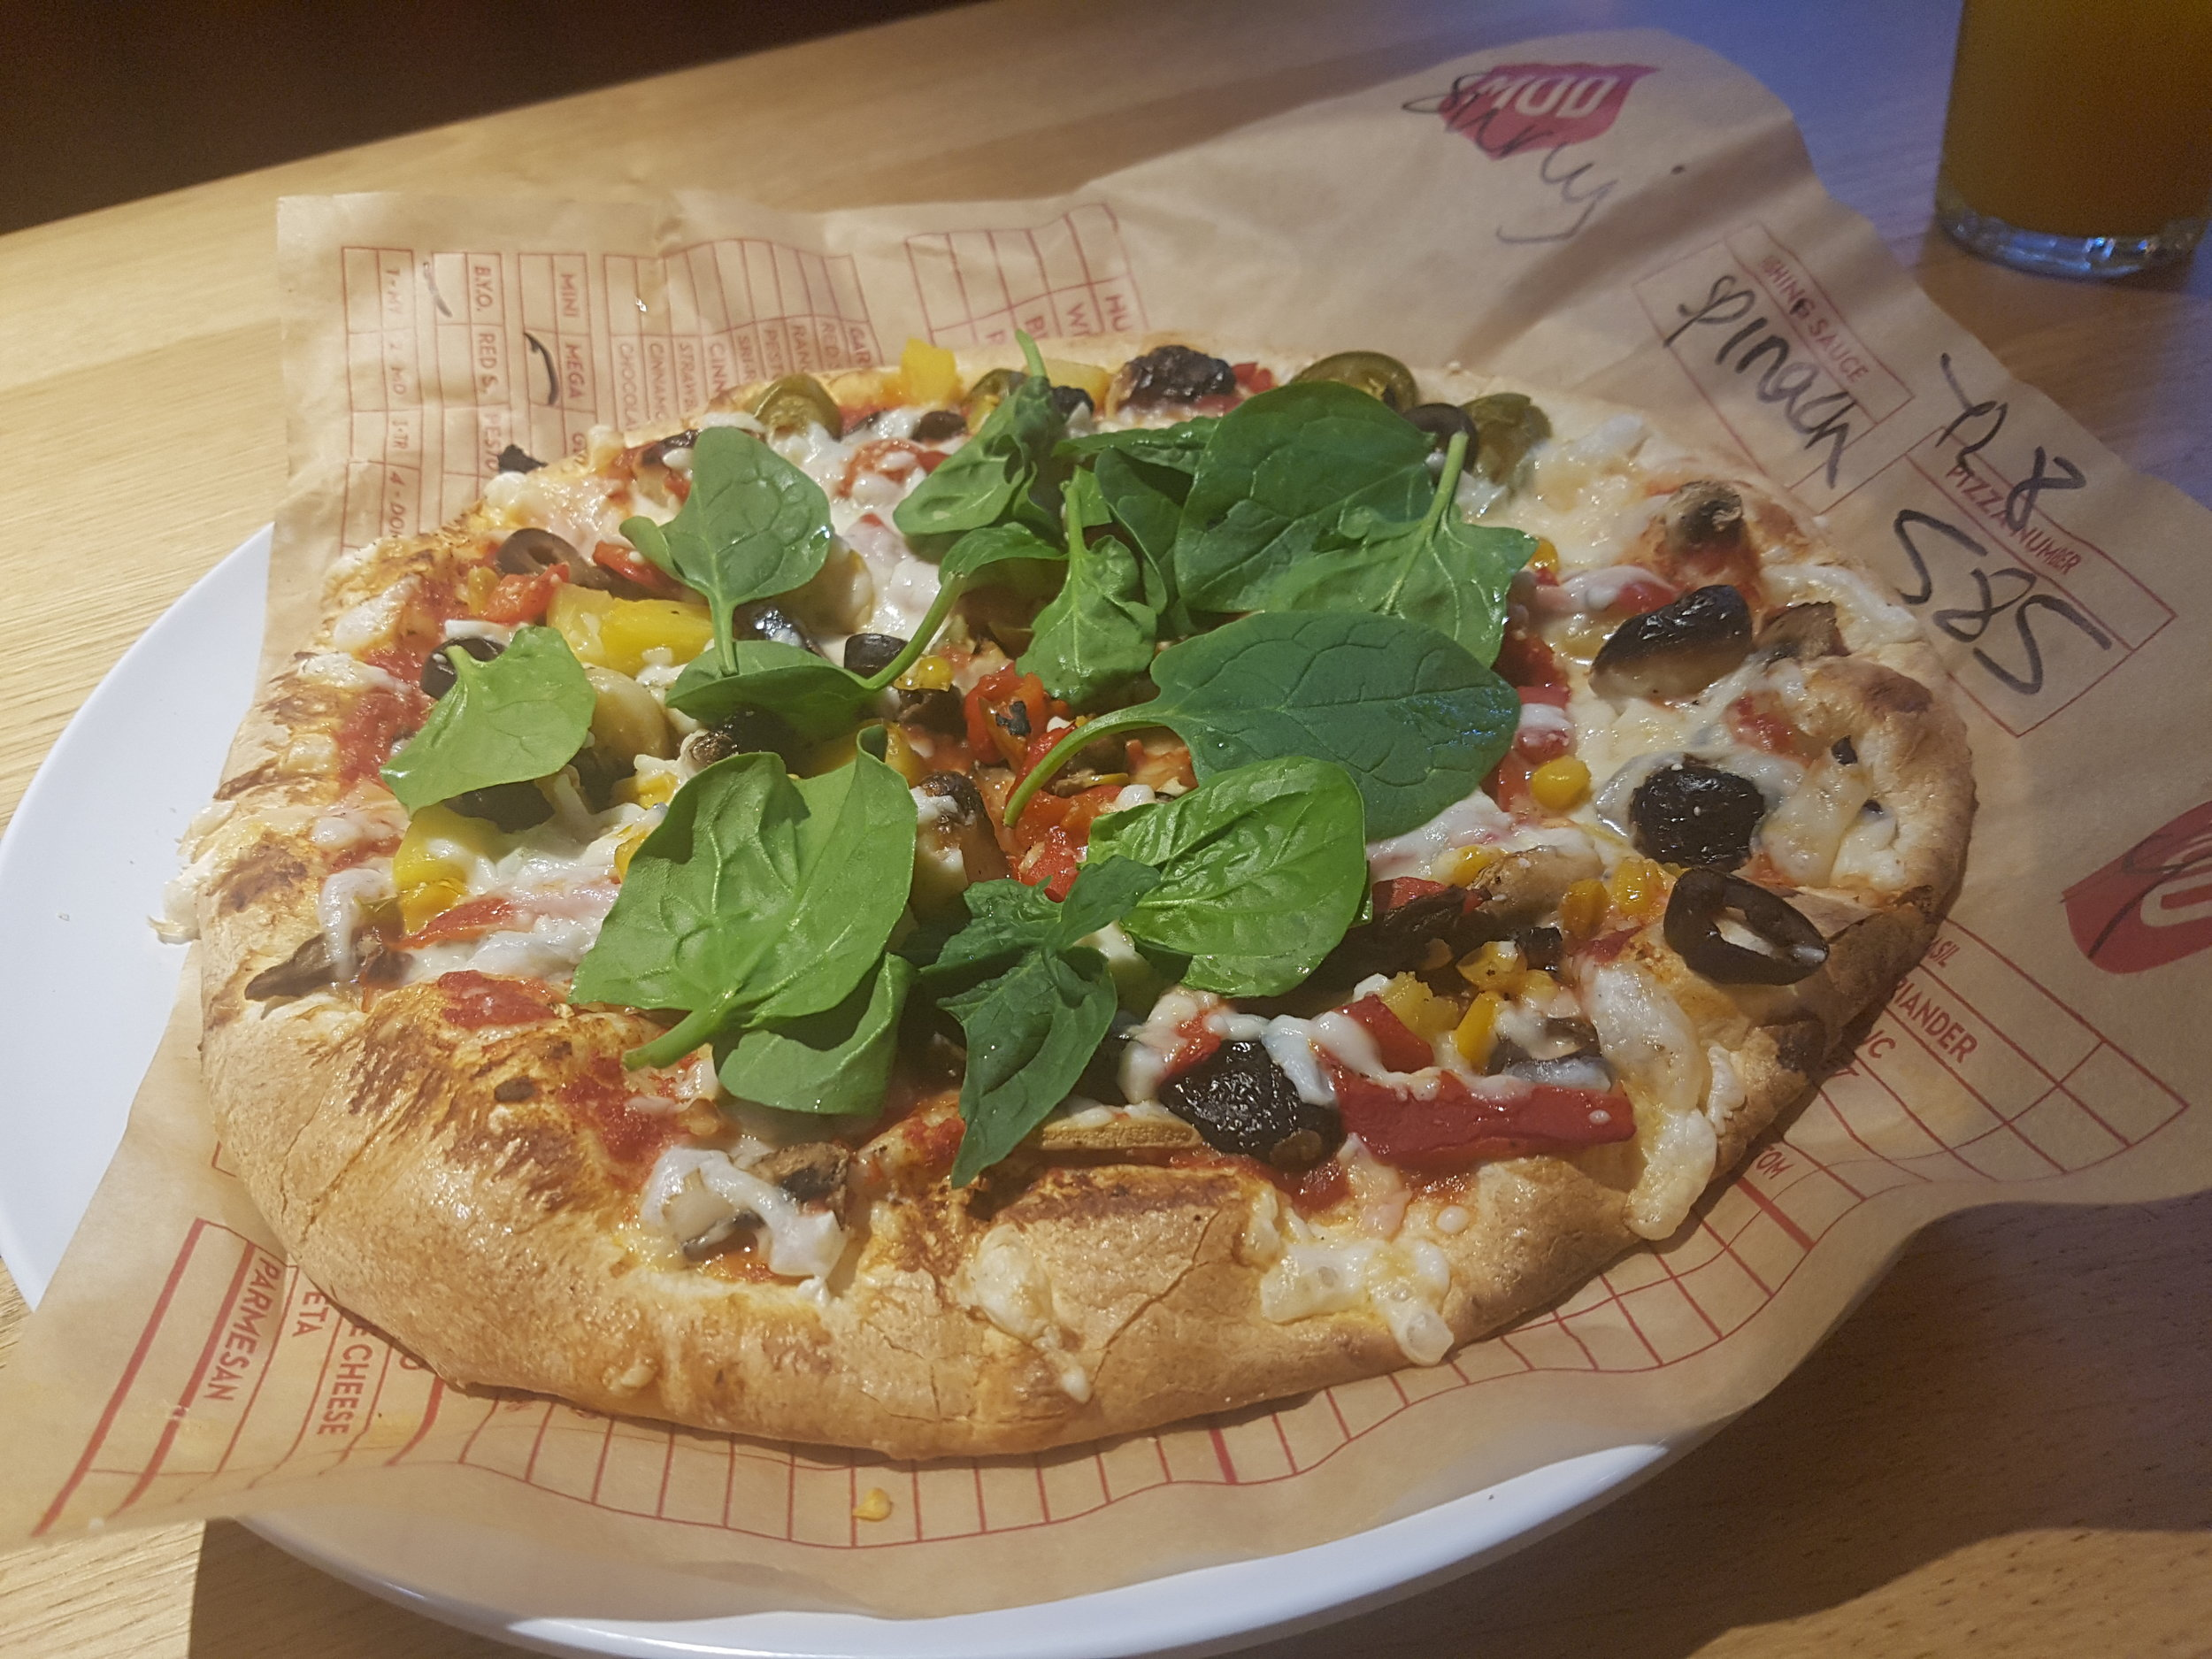 Vegan options at MOD Pizza